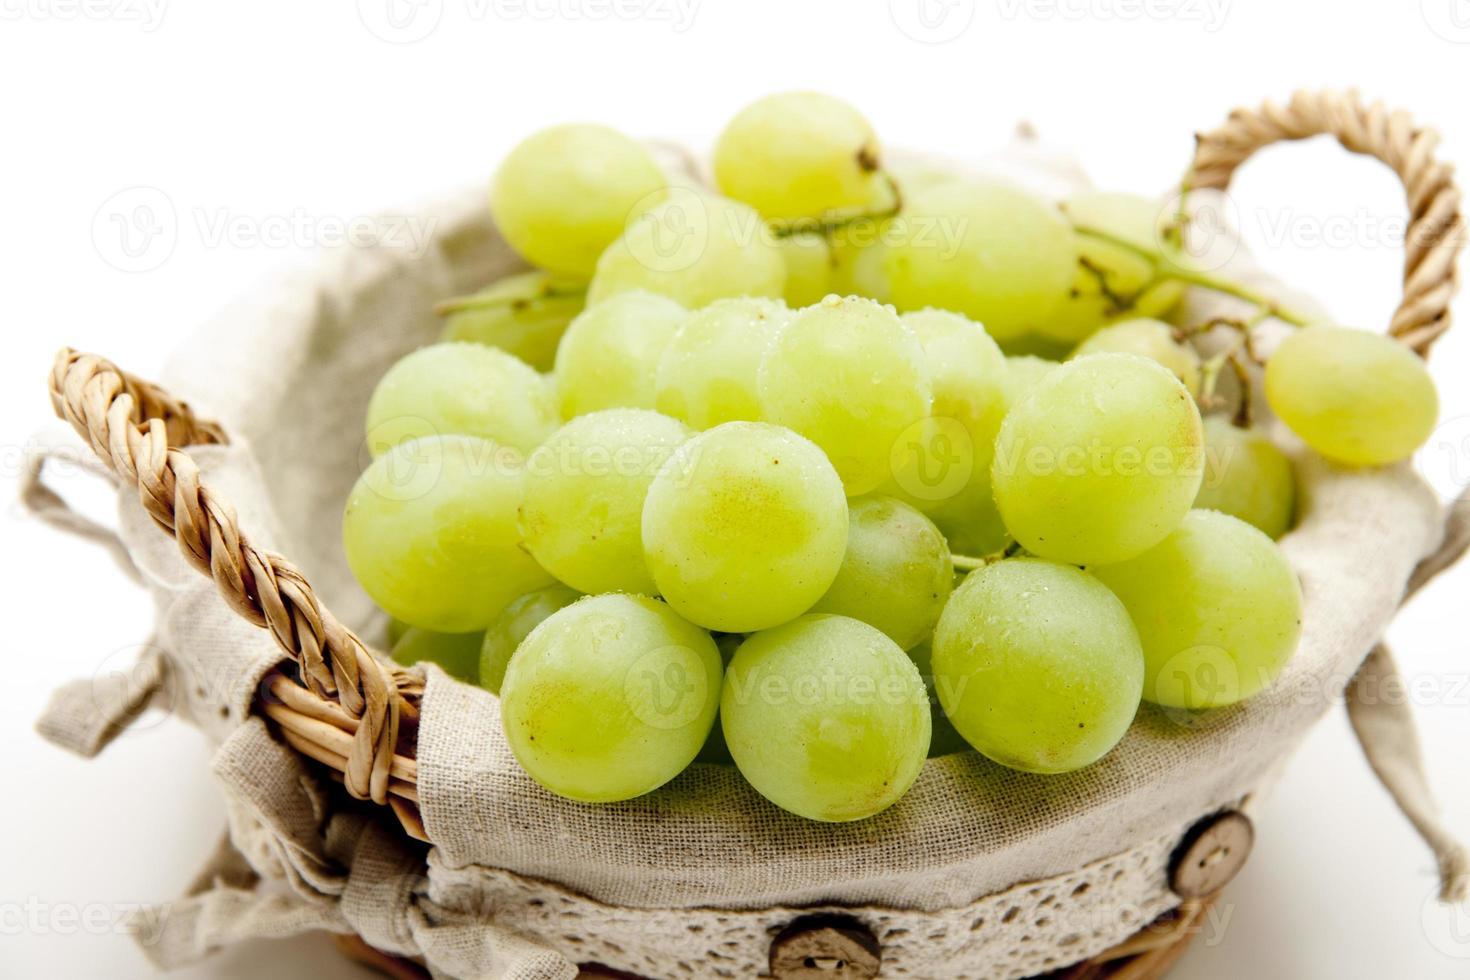 druiven in de mand foto